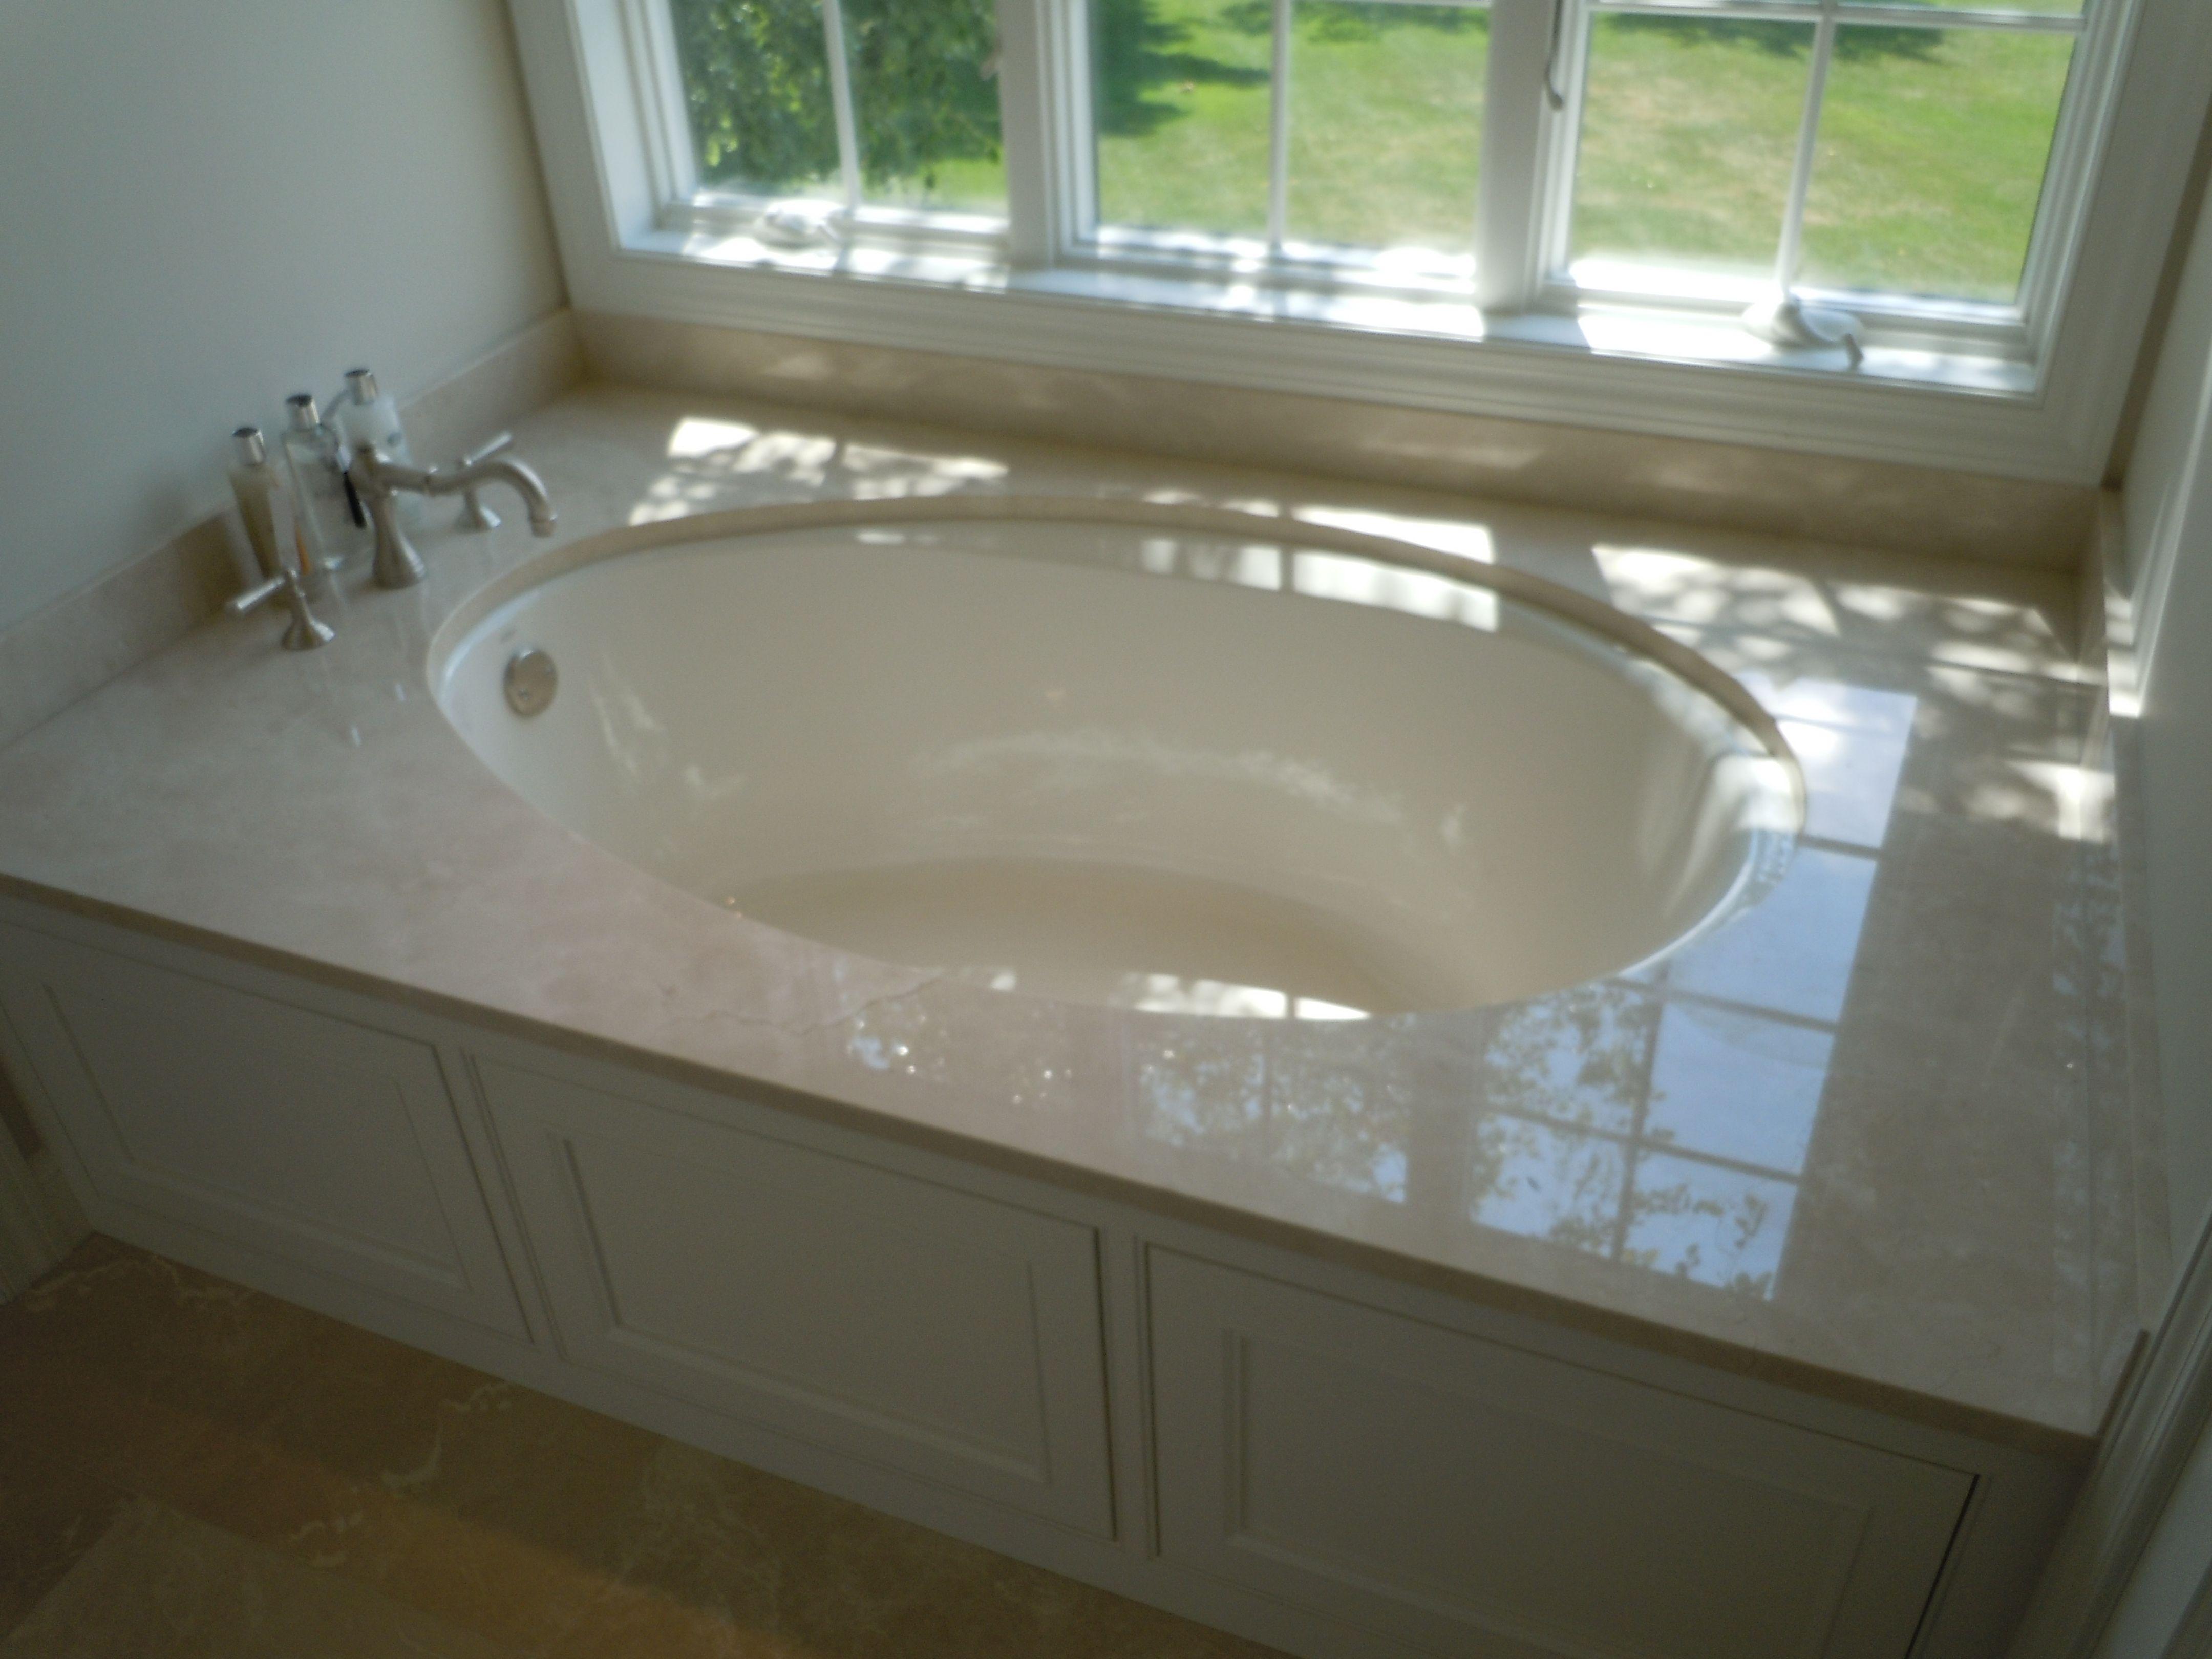 Kohler soaking tub undermount installation, stone top with deck ...